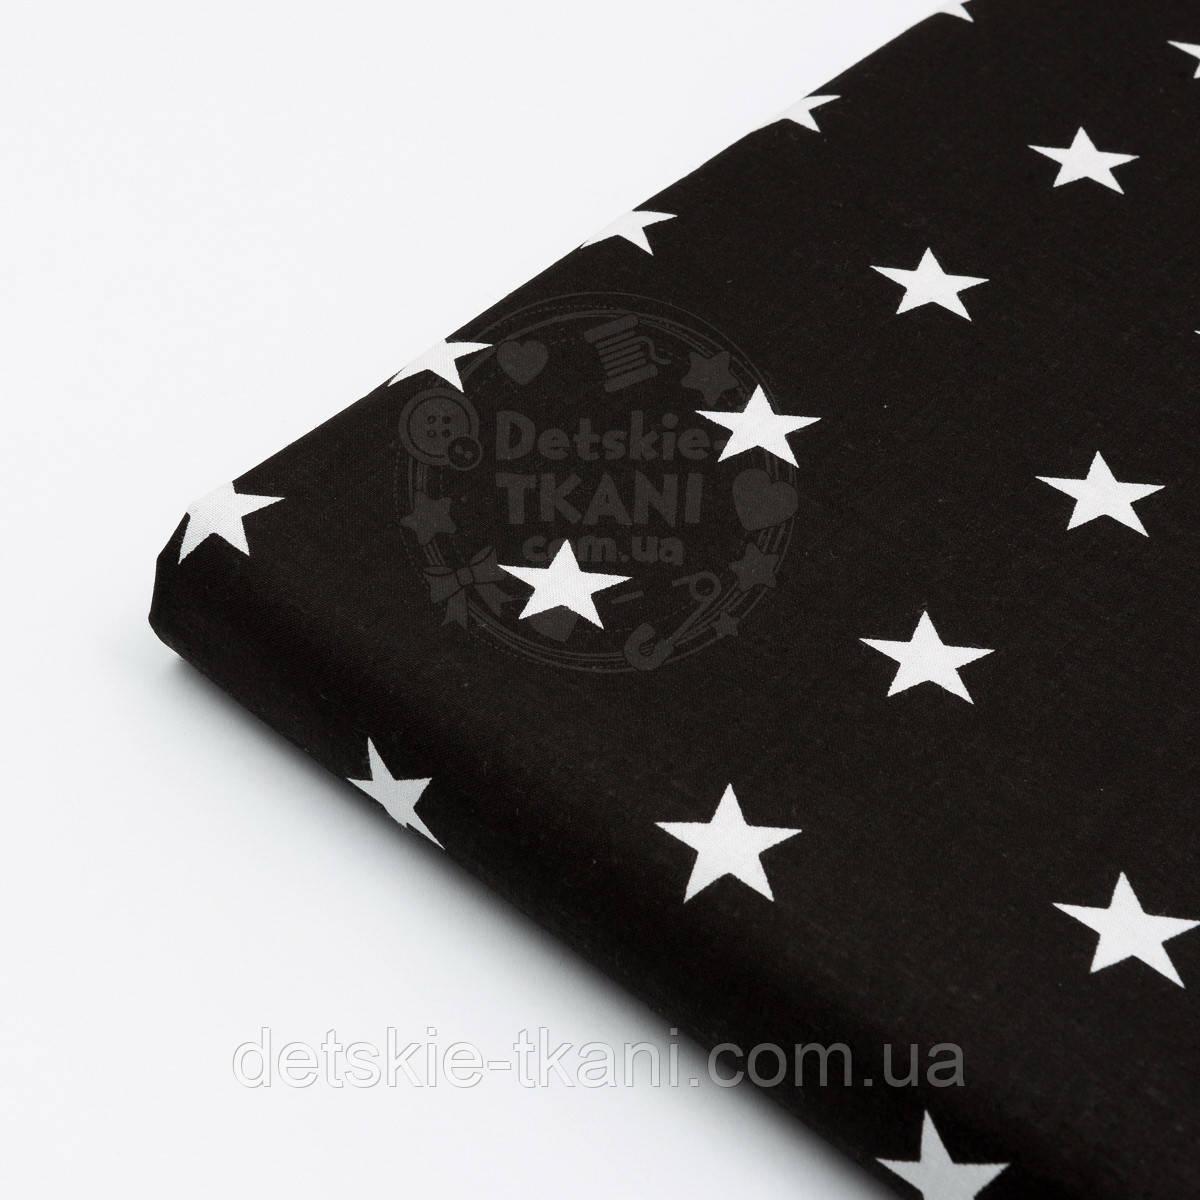 Лоскут ткани №596  с белыми звёздами на чёрном фоне